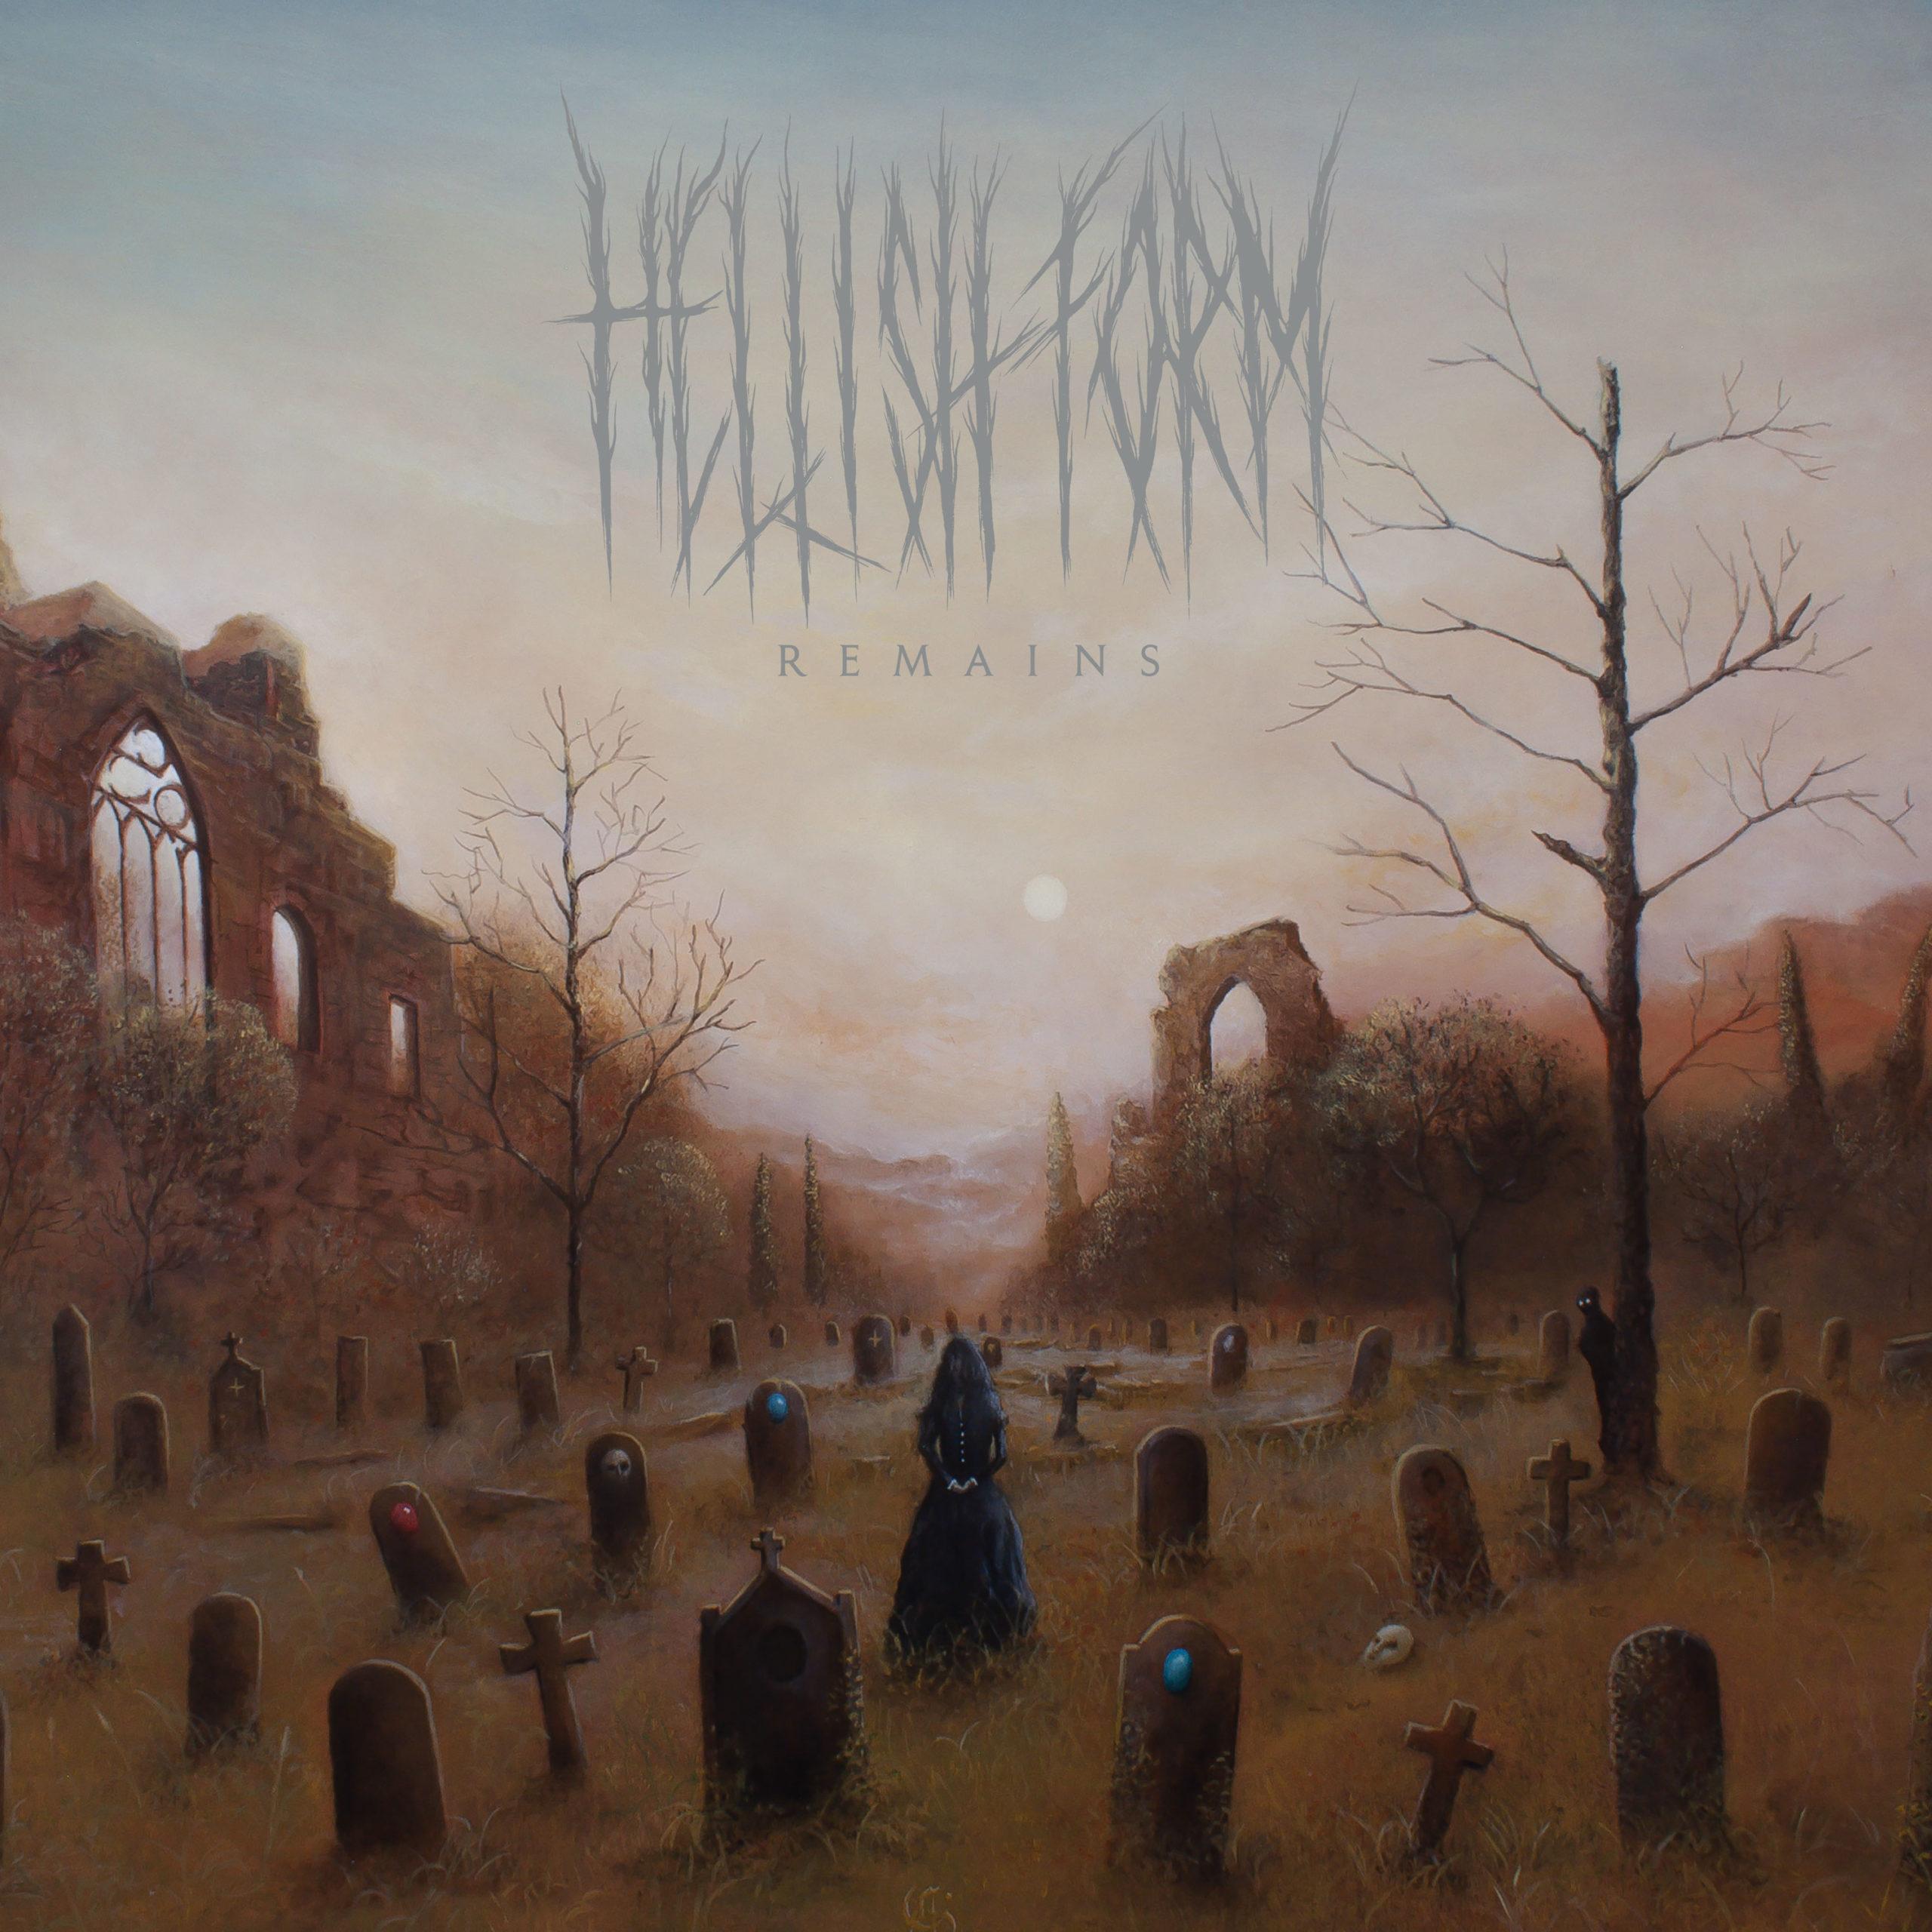 Hellish Form Remains